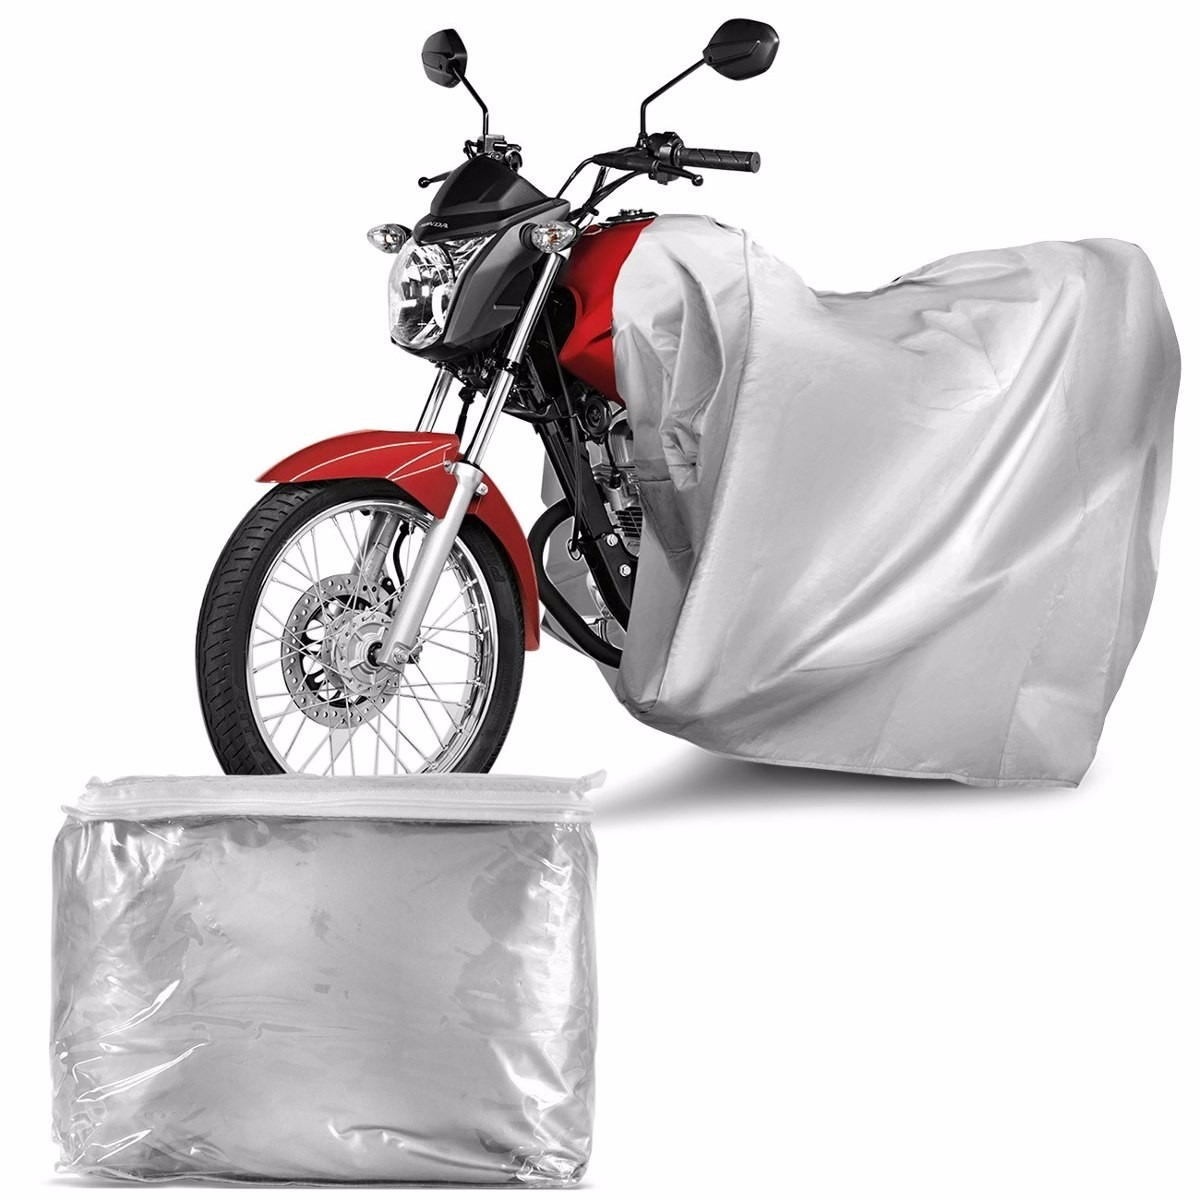 4a29e829488 Capa Cobrir Moto Xre 300 Dt Lander Xtz 250 Xj6 Xt 225 600 E - R$ 32,39 em Mercado  Livre